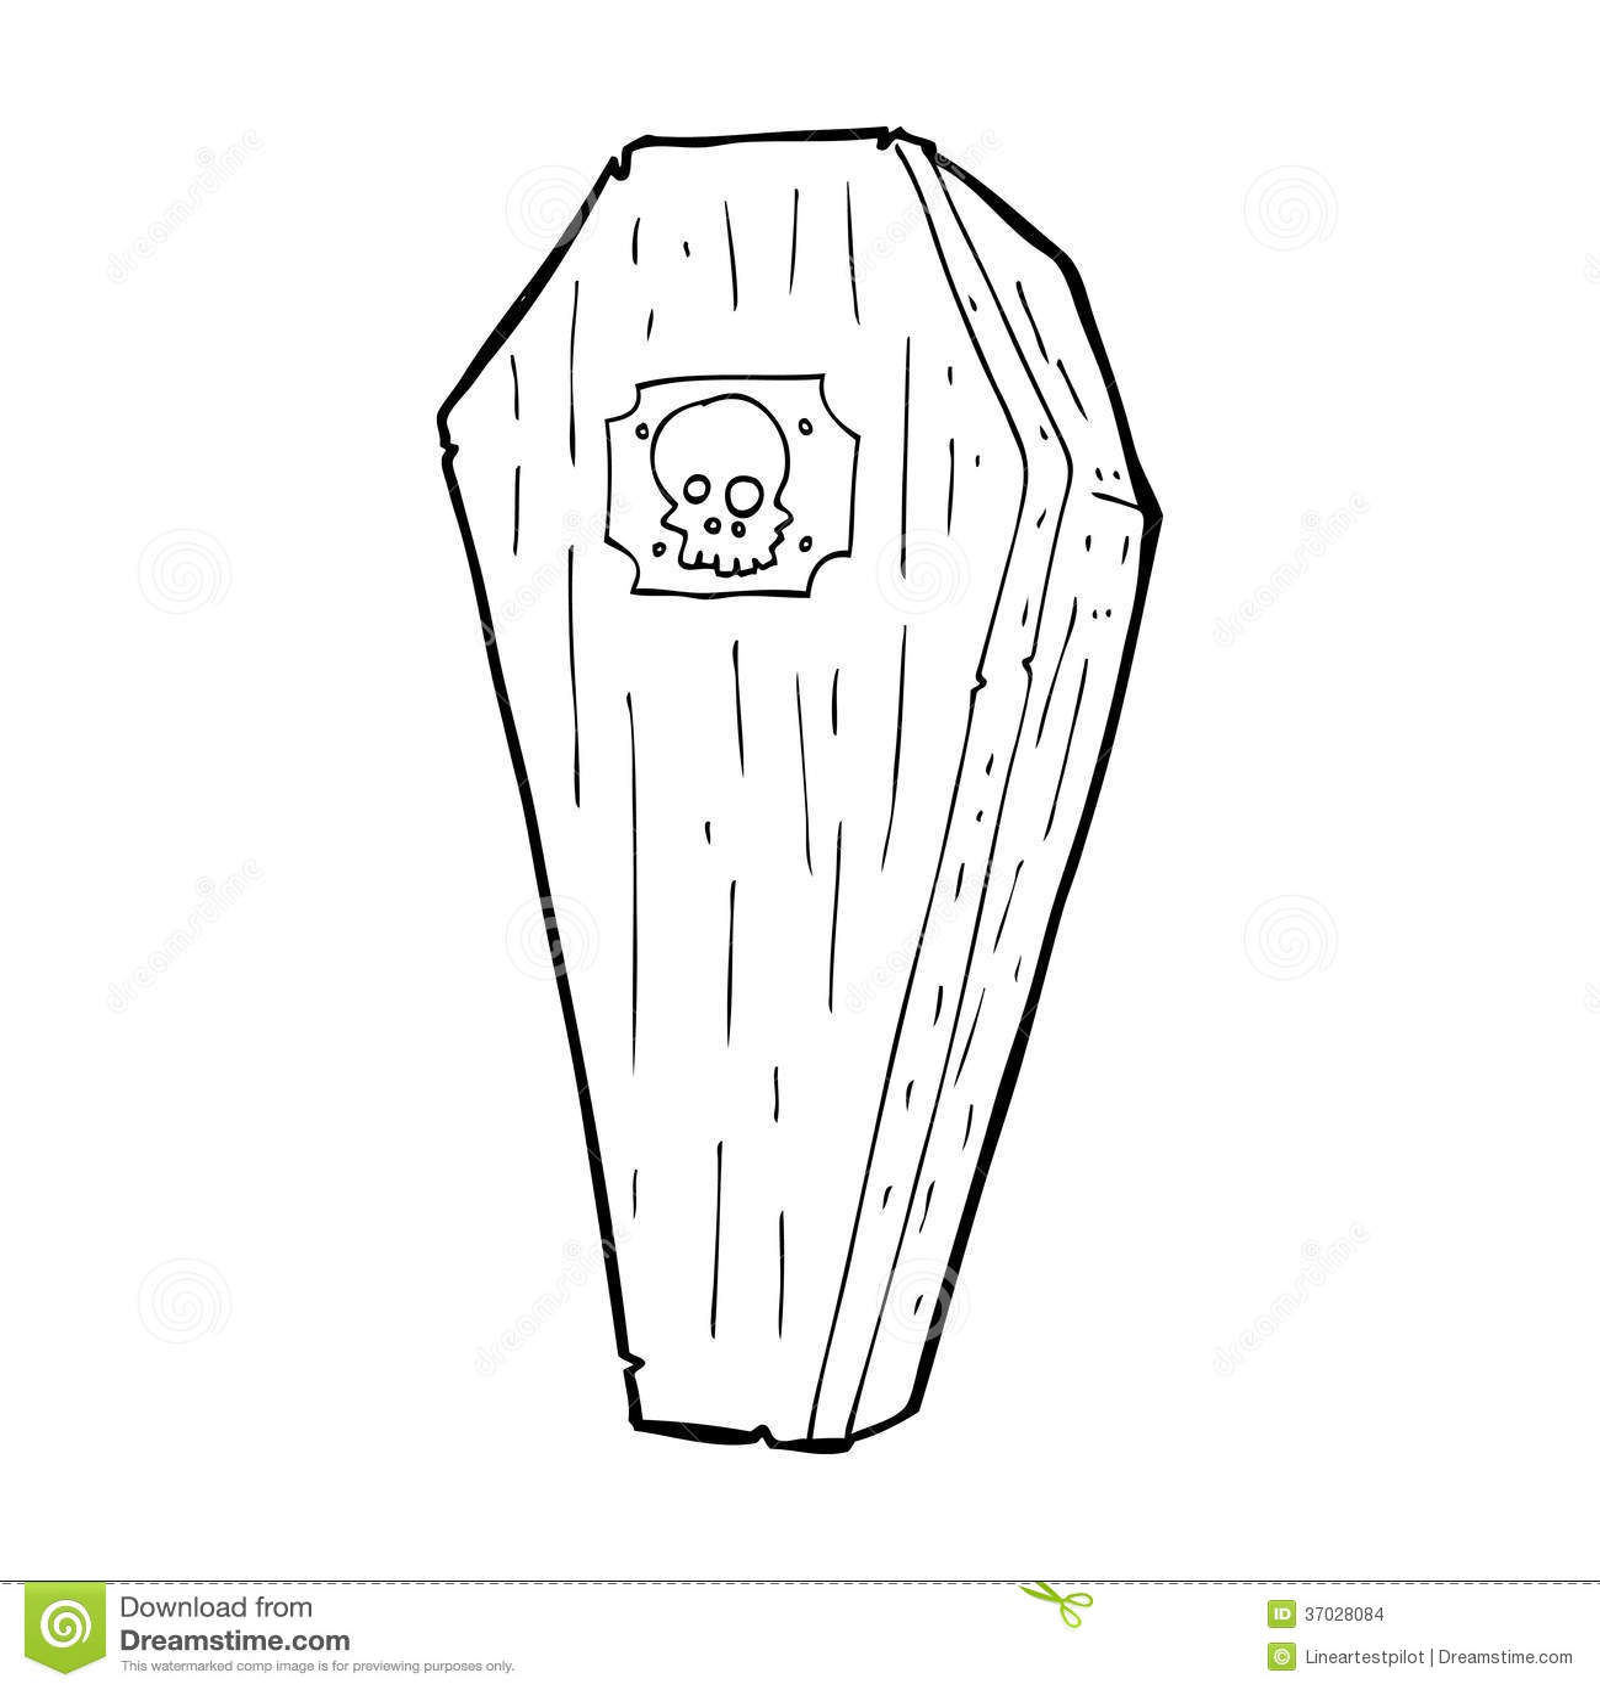 Рисунок гроба памятник из мрамора саратов цена